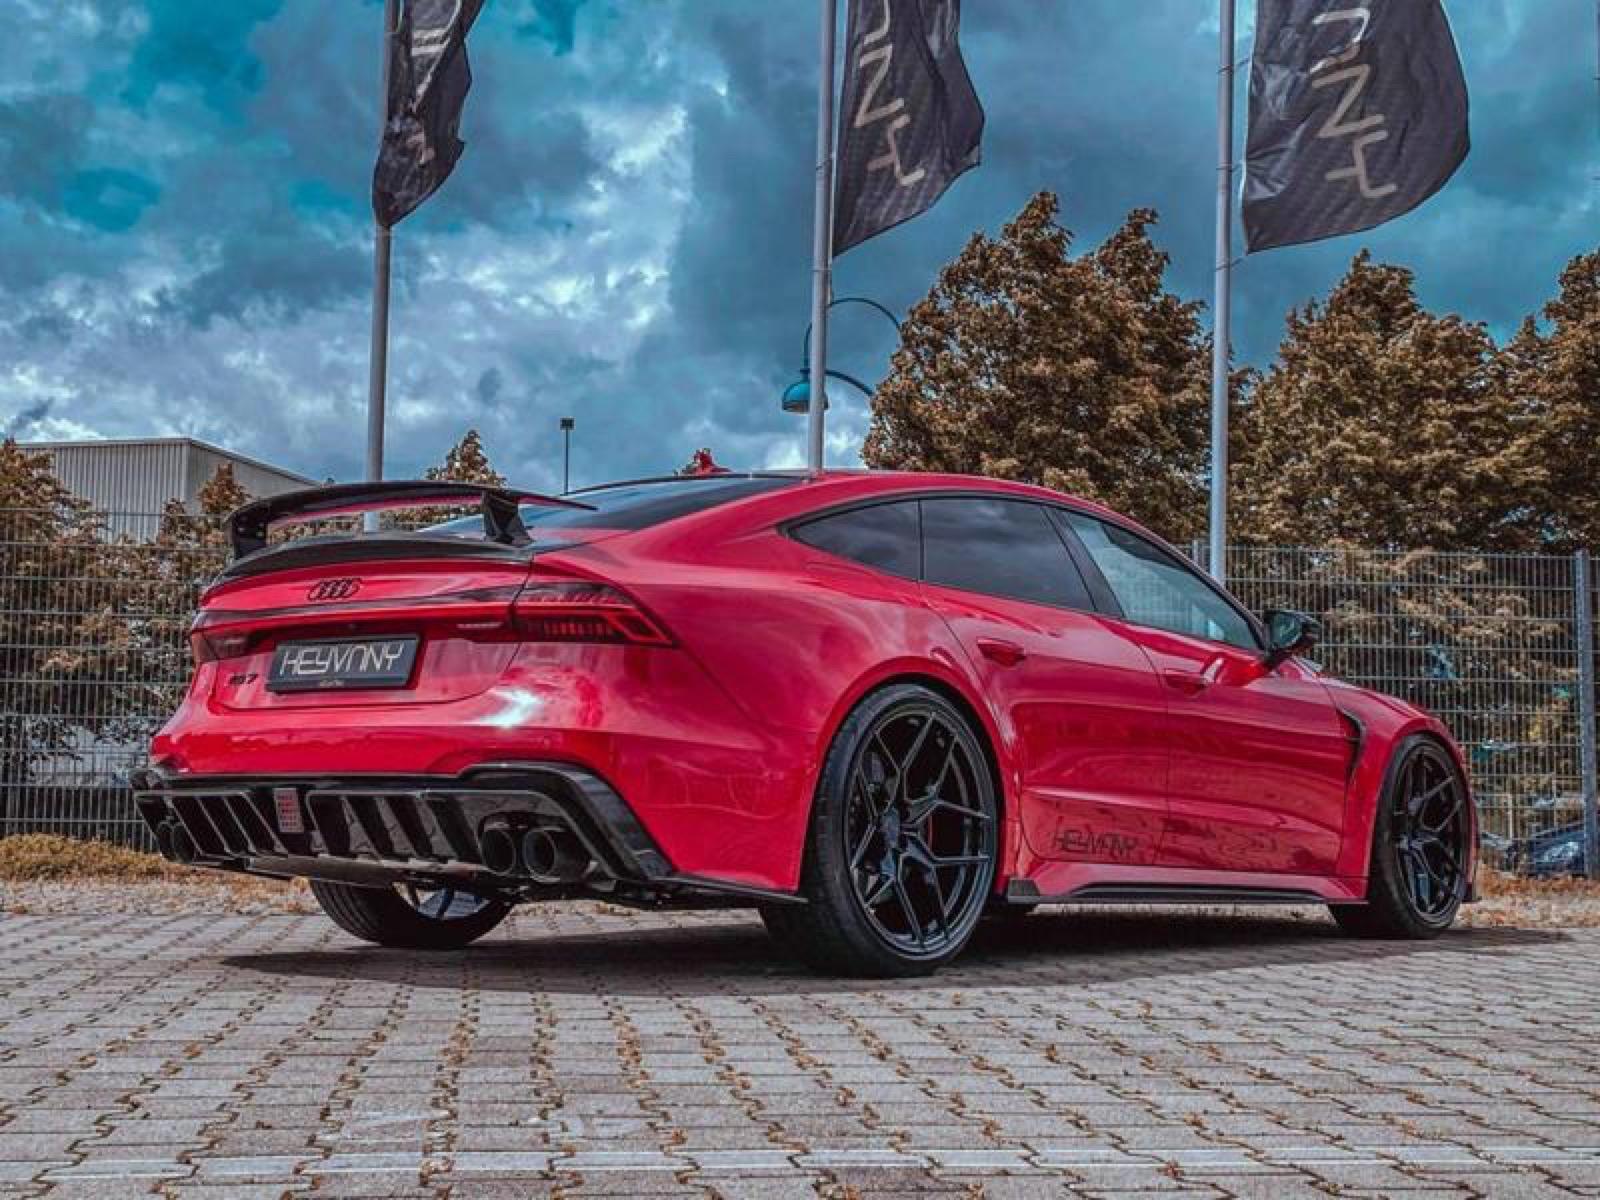 Audi-RS7-by-Keyvany-3